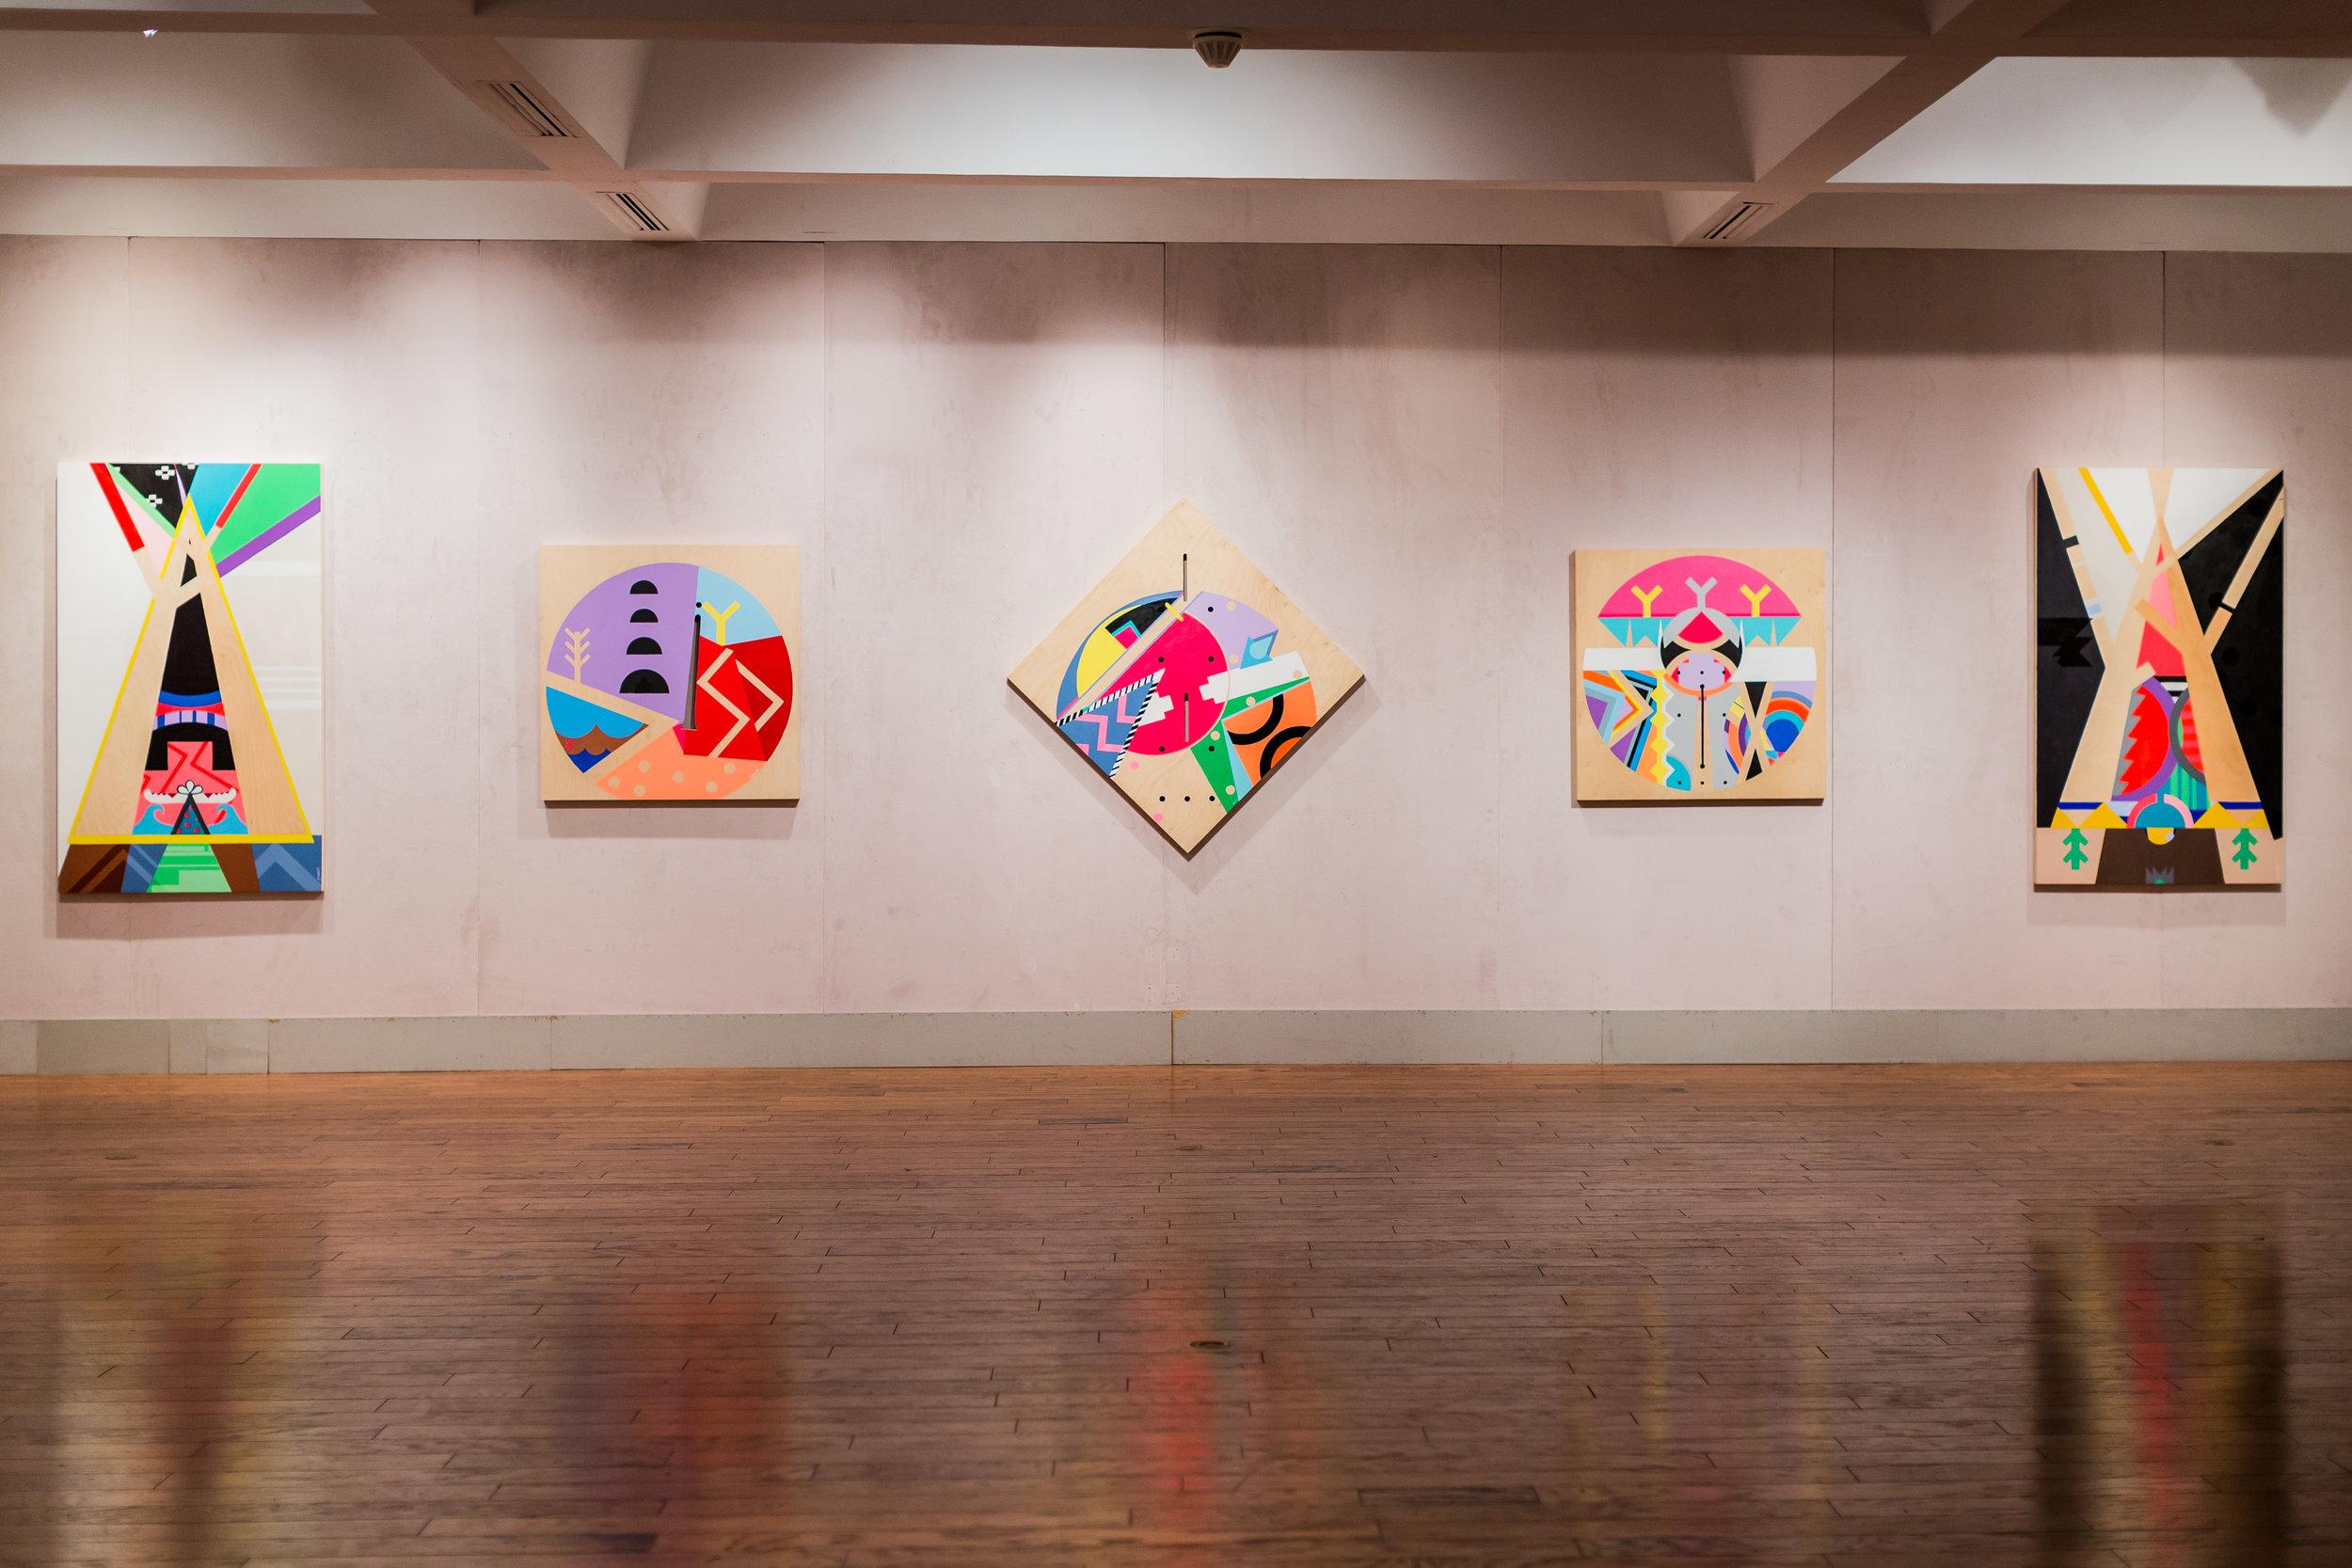 Exhibition view, Grenfell Campus Art Gallery, Corner Brook, 2018